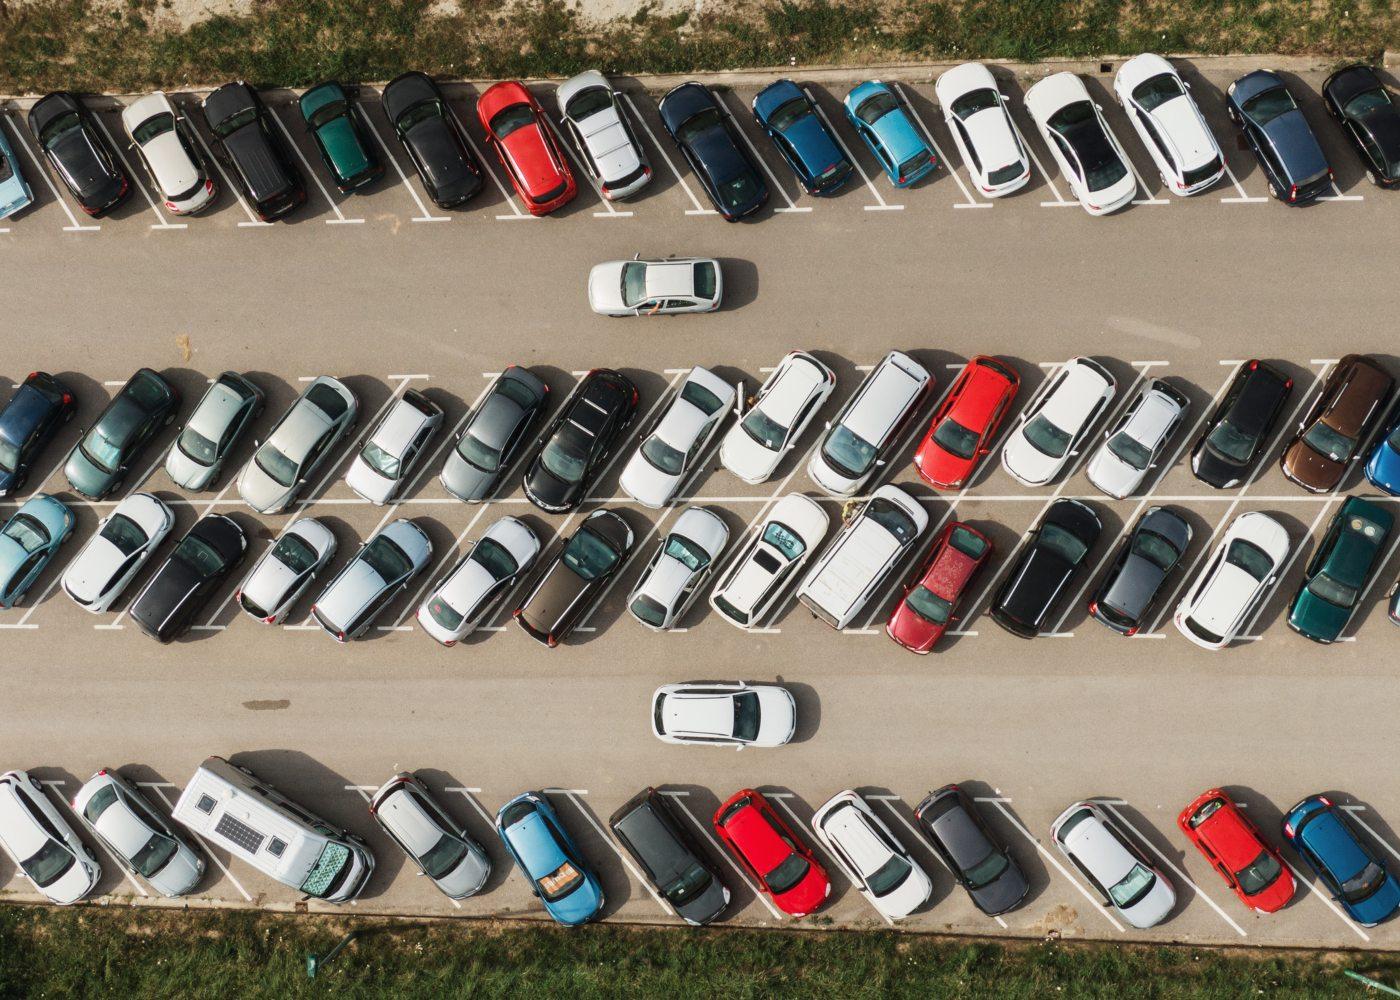 carros estacionados num parque